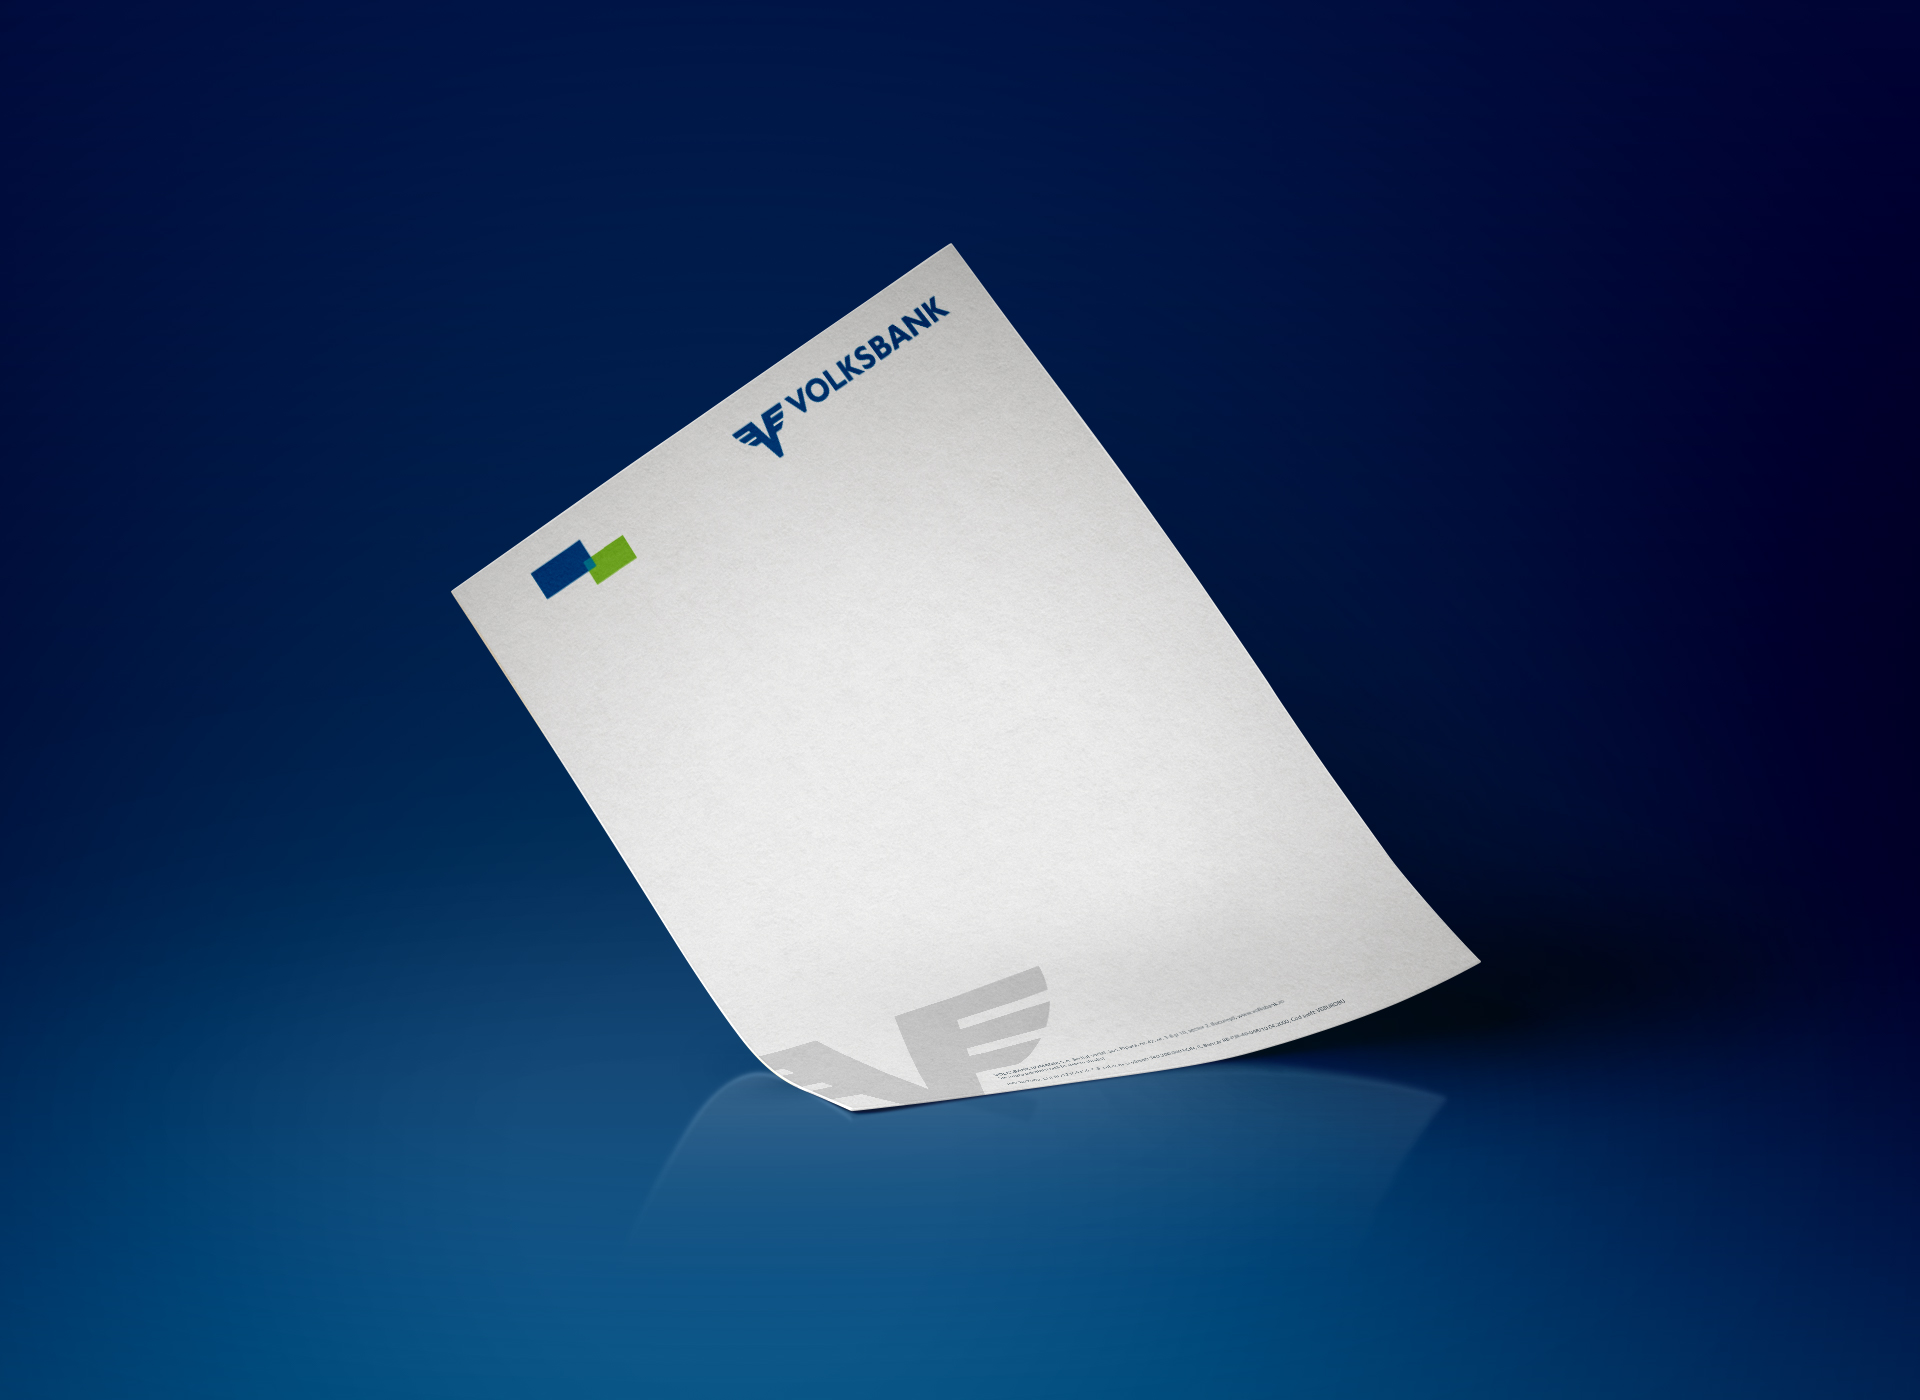 volksbank business antet inoveo